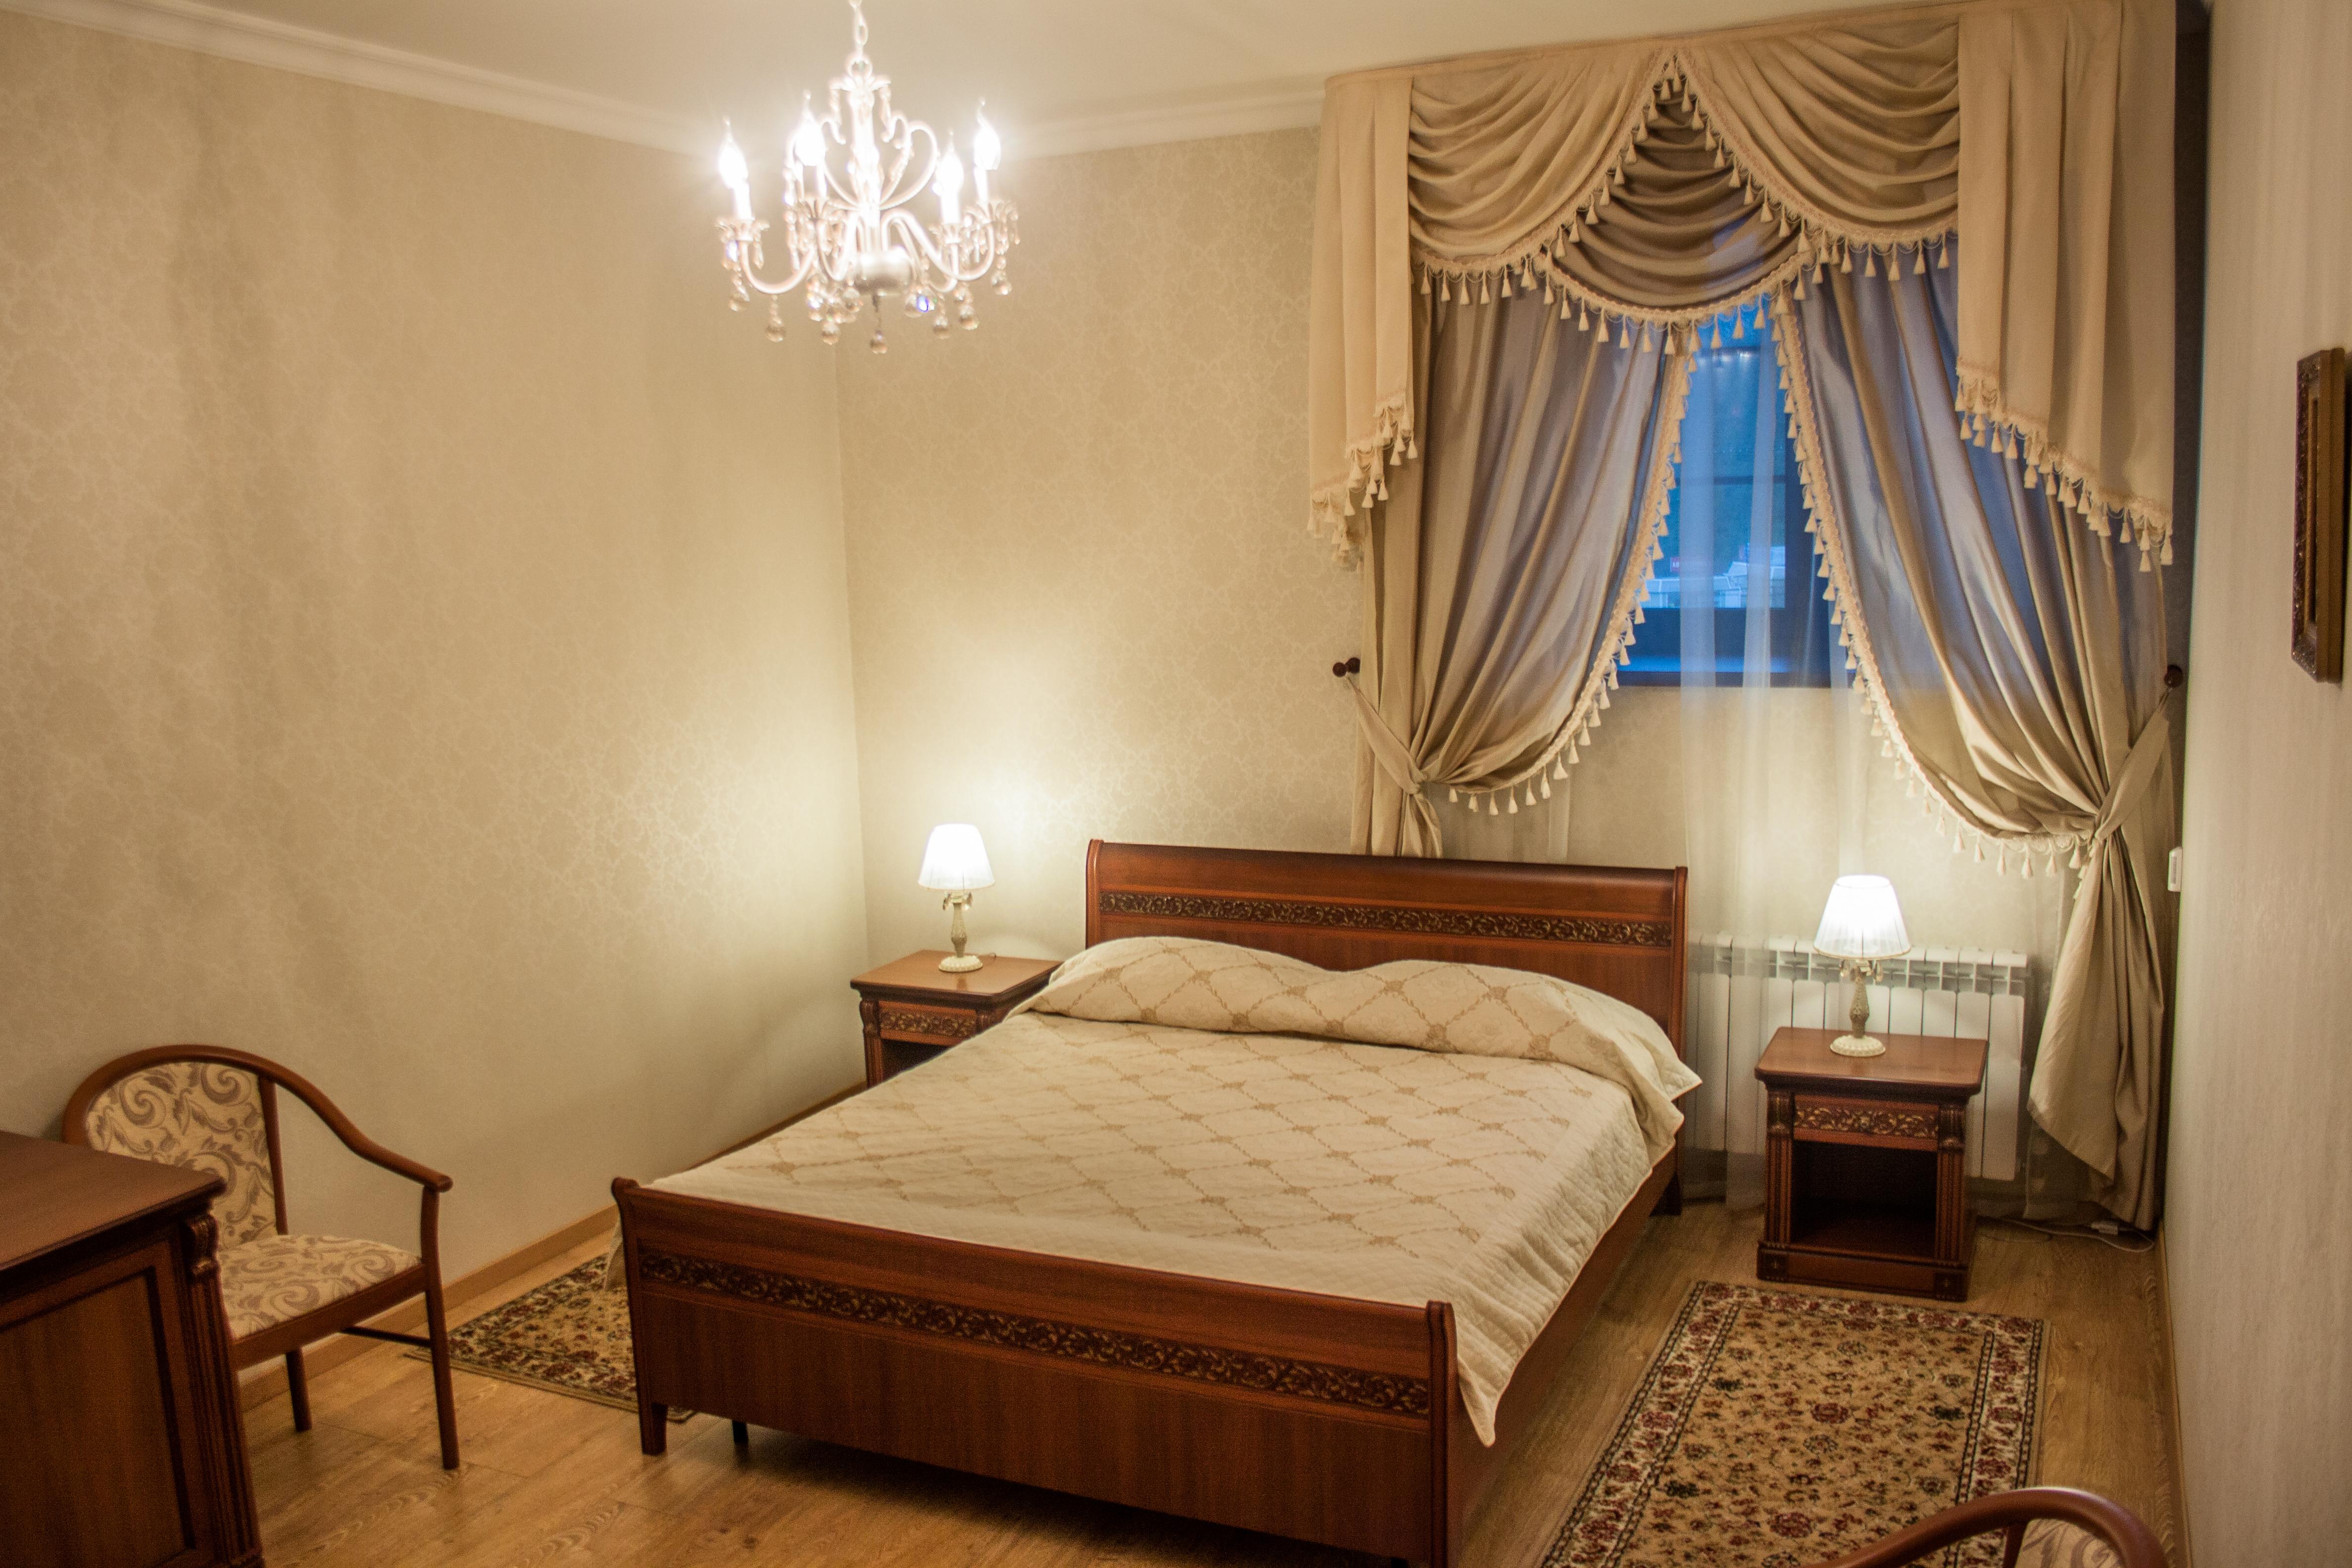 Гостиница «Келарская набережная»